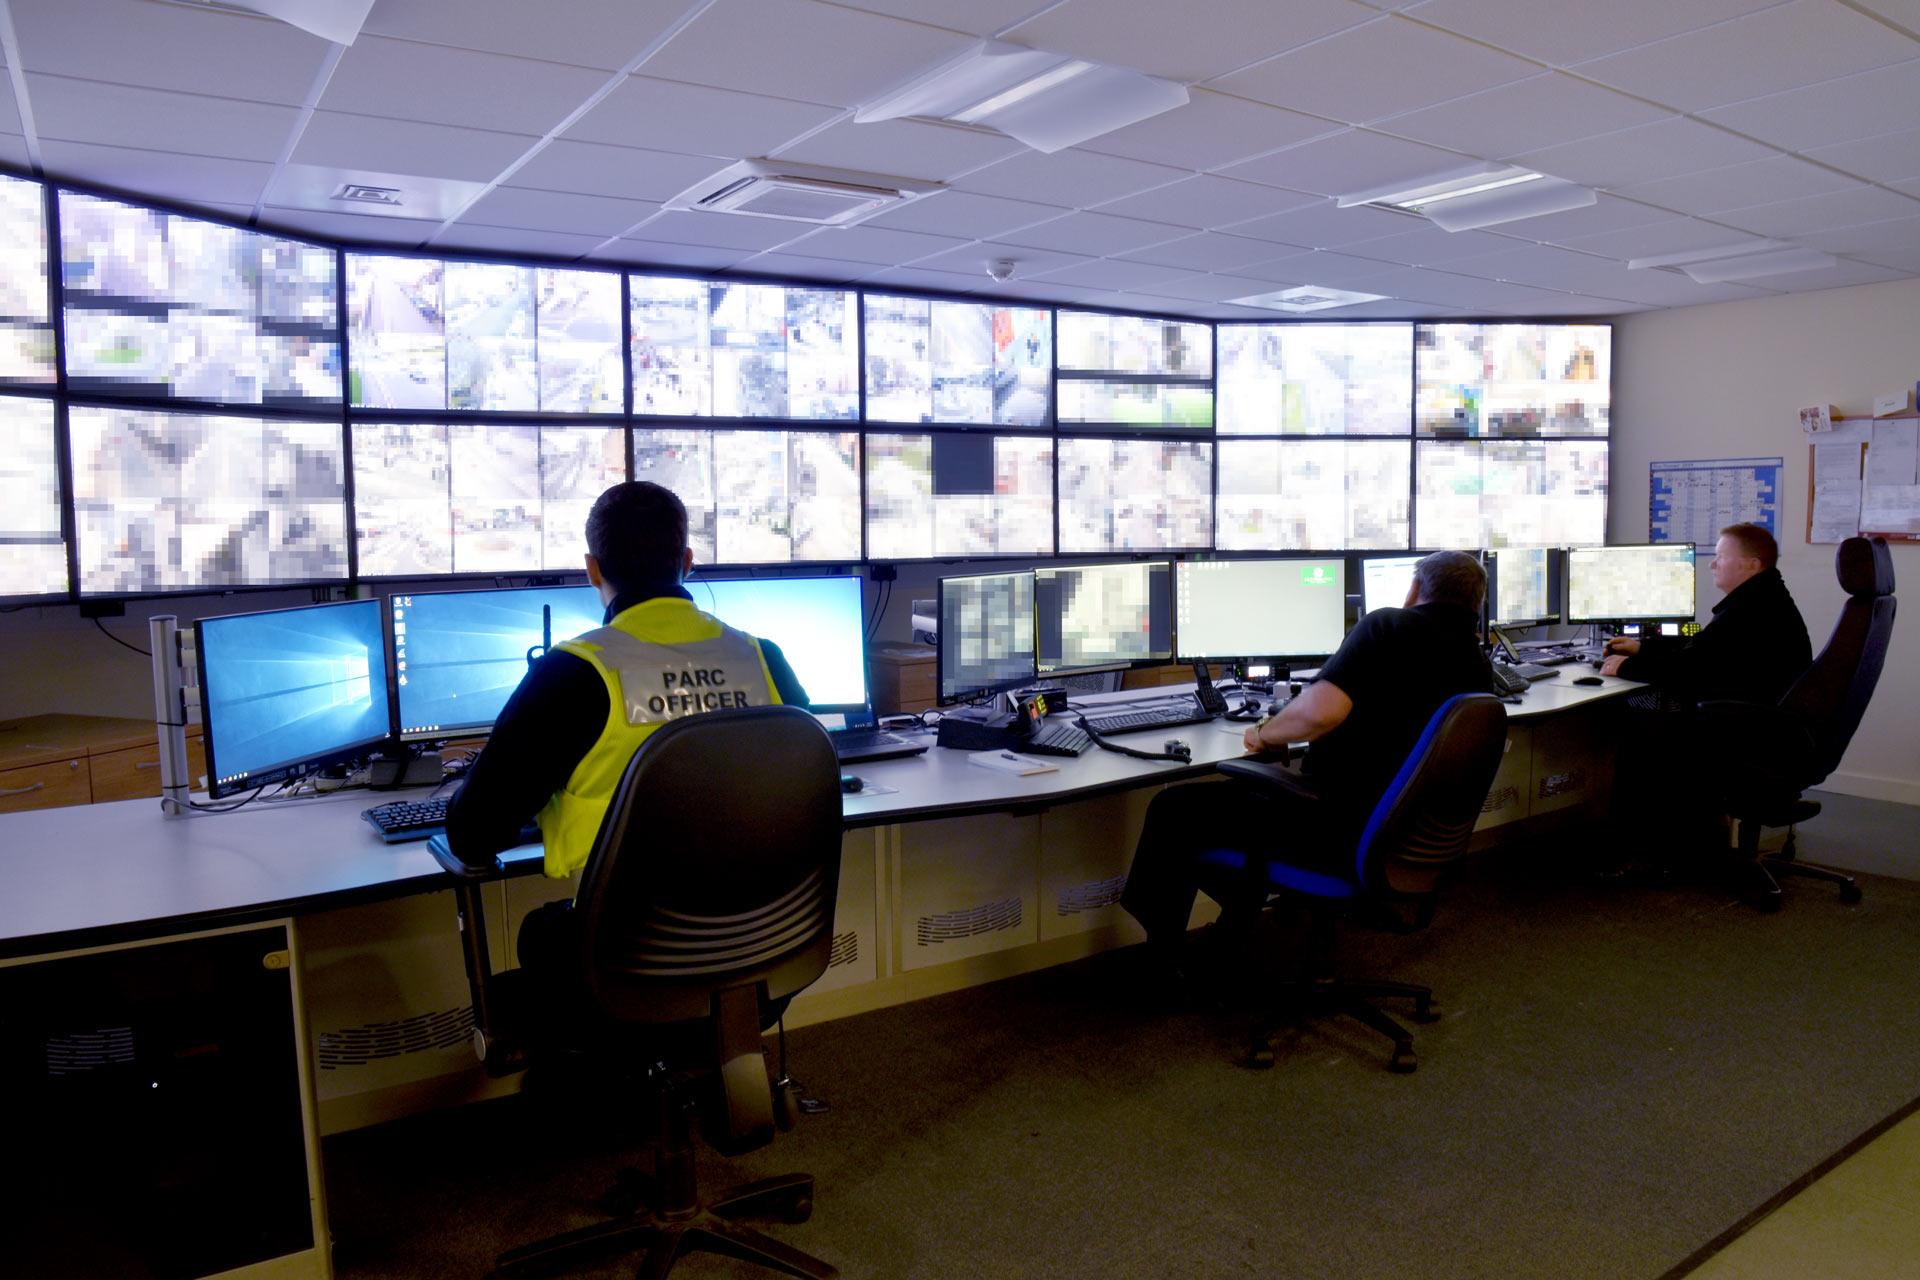 plymouth city council cctv control room